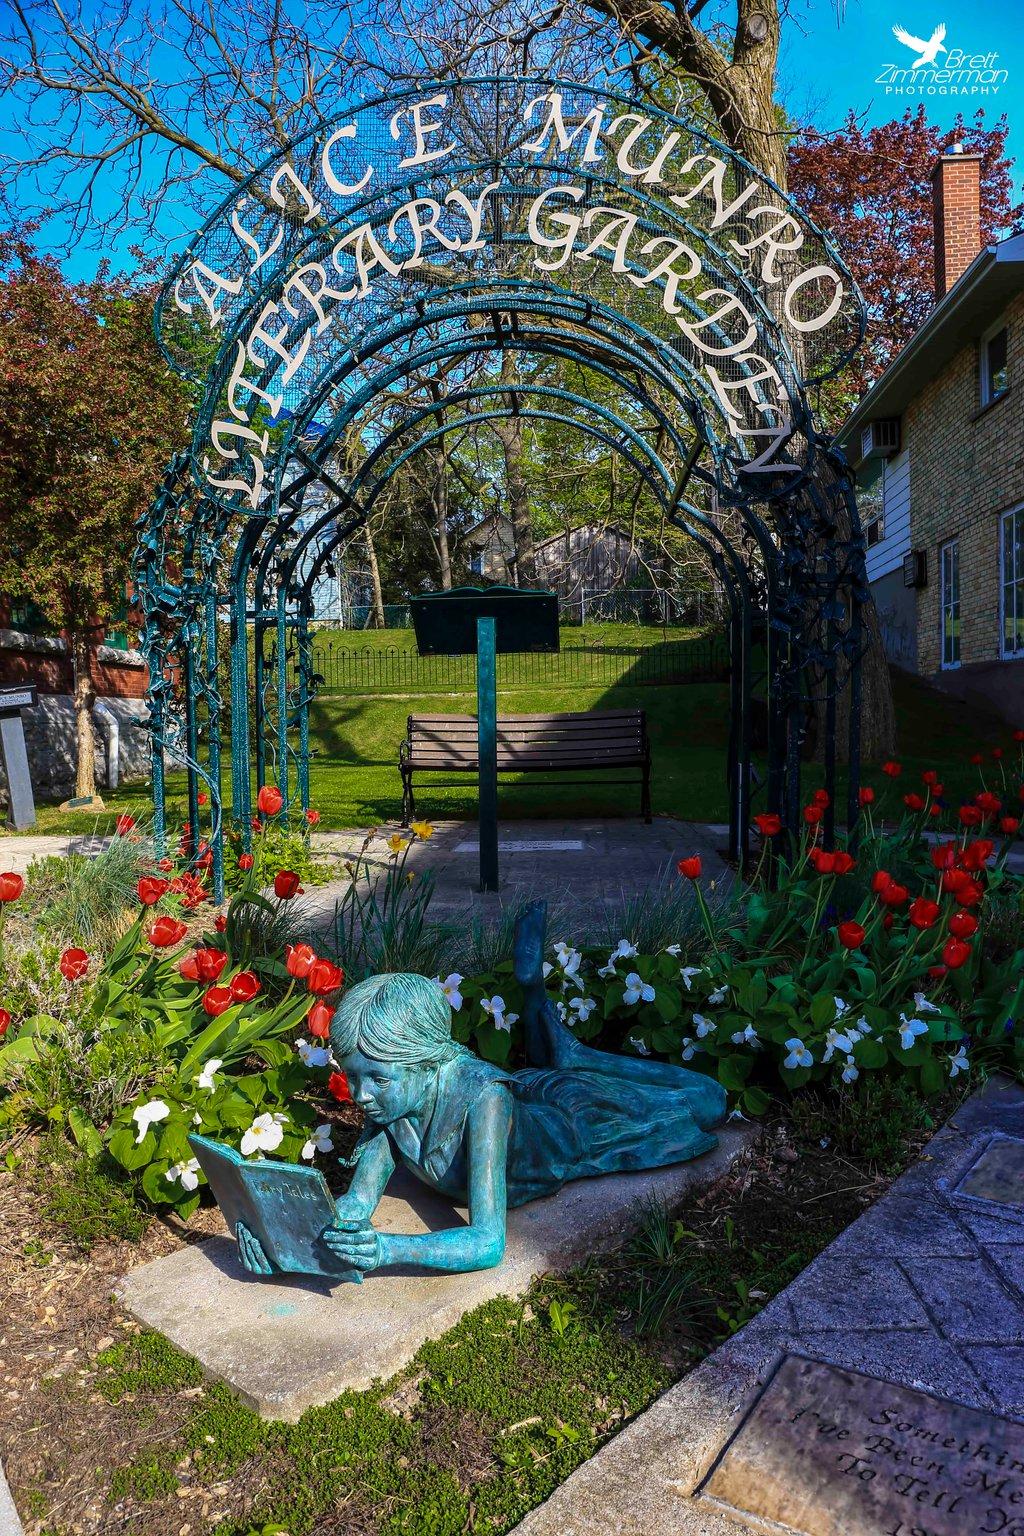 alice_munro_literary_garden_by_brettazimmerman-d8ti1nr